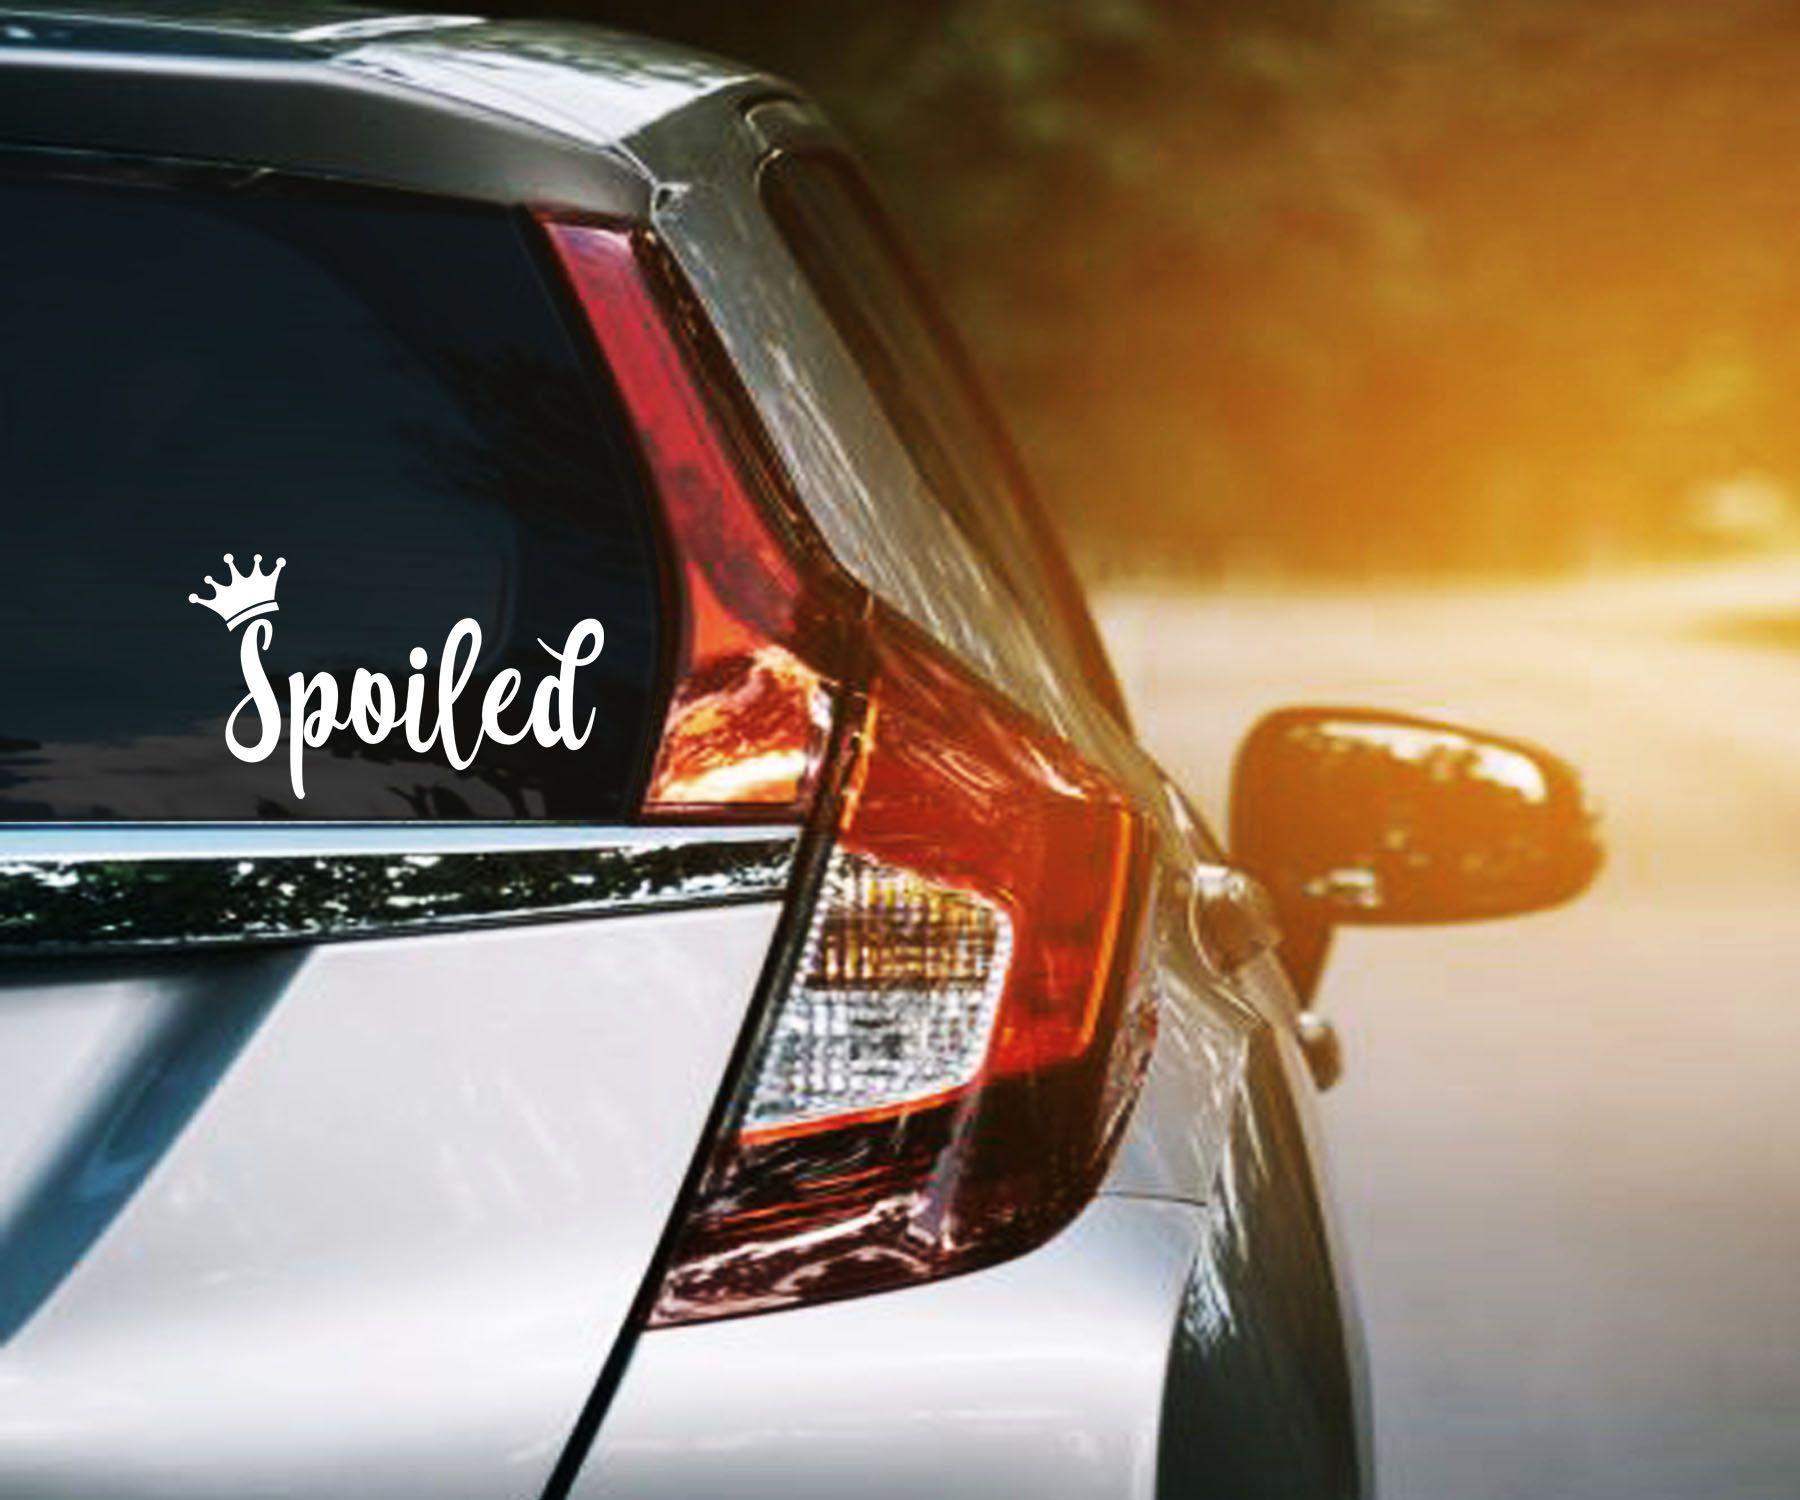 Spoiled Vinyl Decal Queen Princess Crown Car Window Sticker Etsy Vinyl Decals Window Stickers Car Window Stickers [ 1500 x 1800 Pixel ]